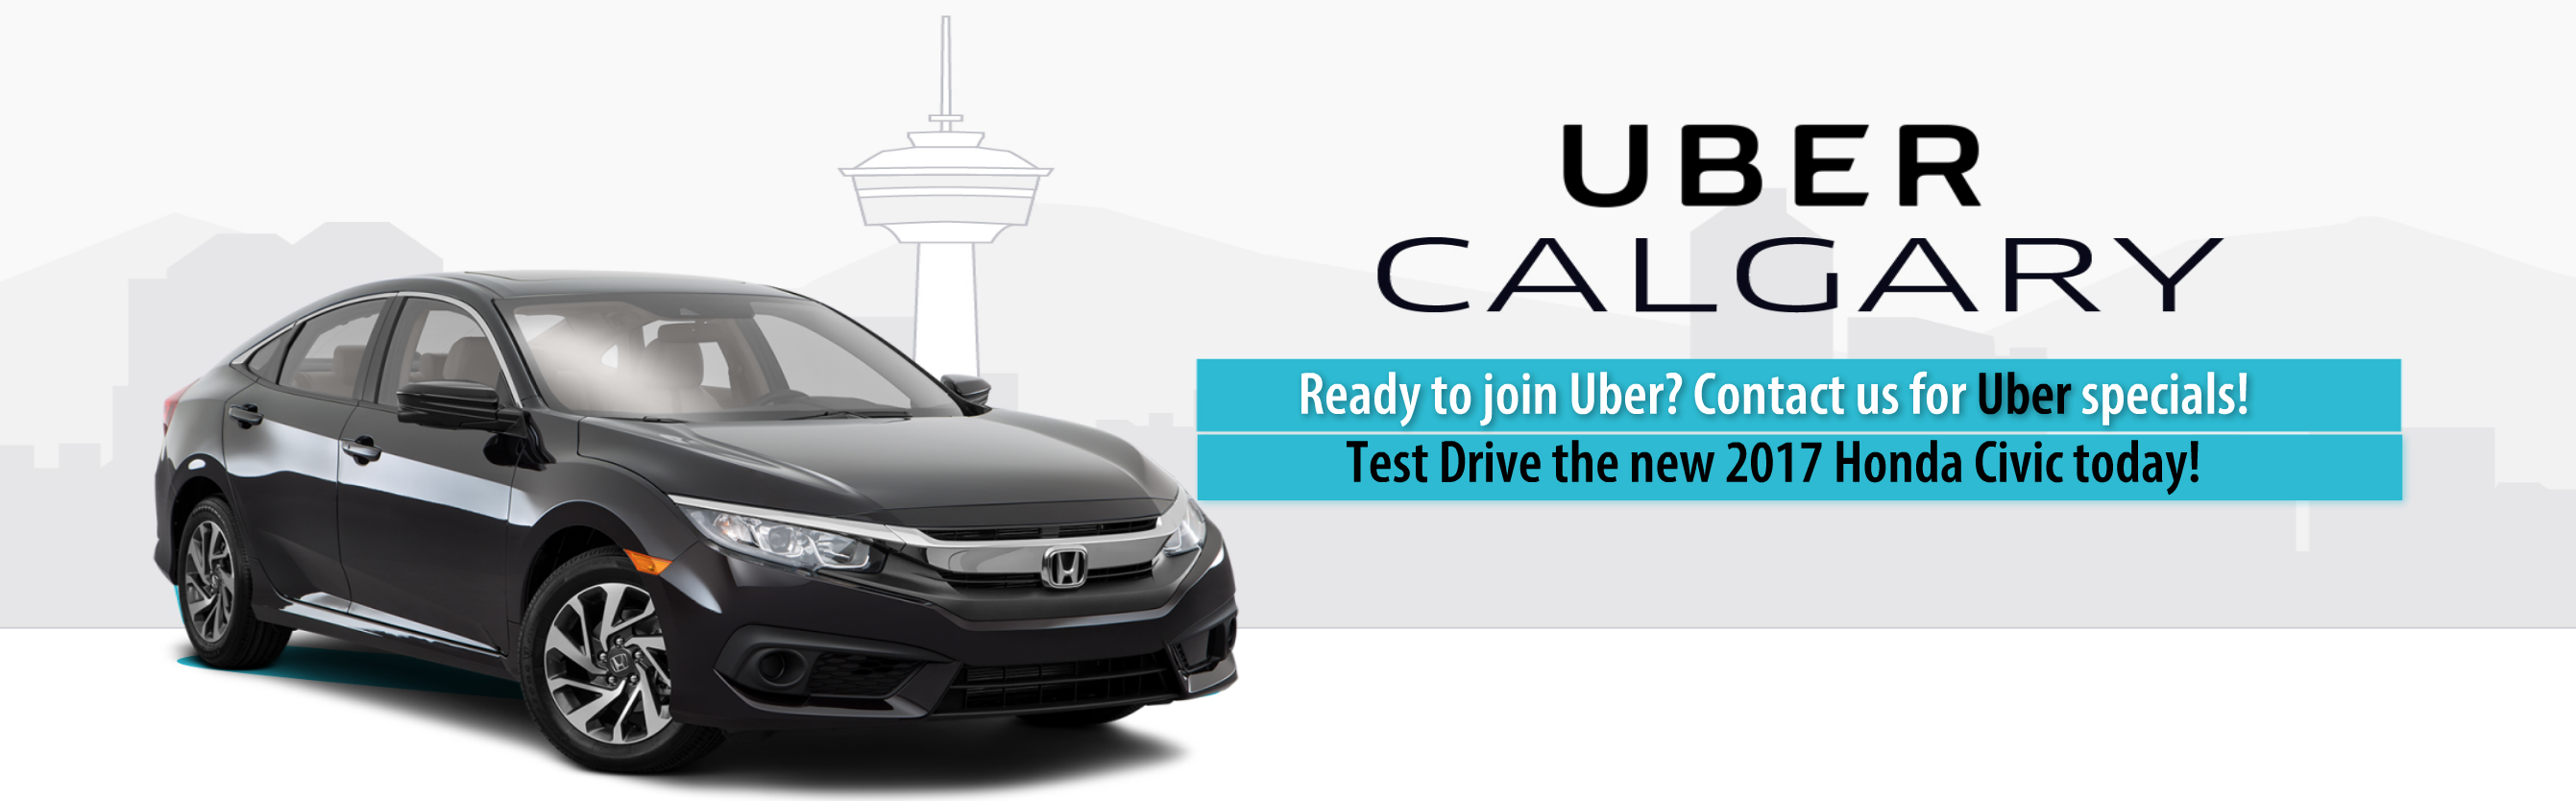 Best Car for Uber Calgary, Honda Civic from Okotoks Honda, South Calgary